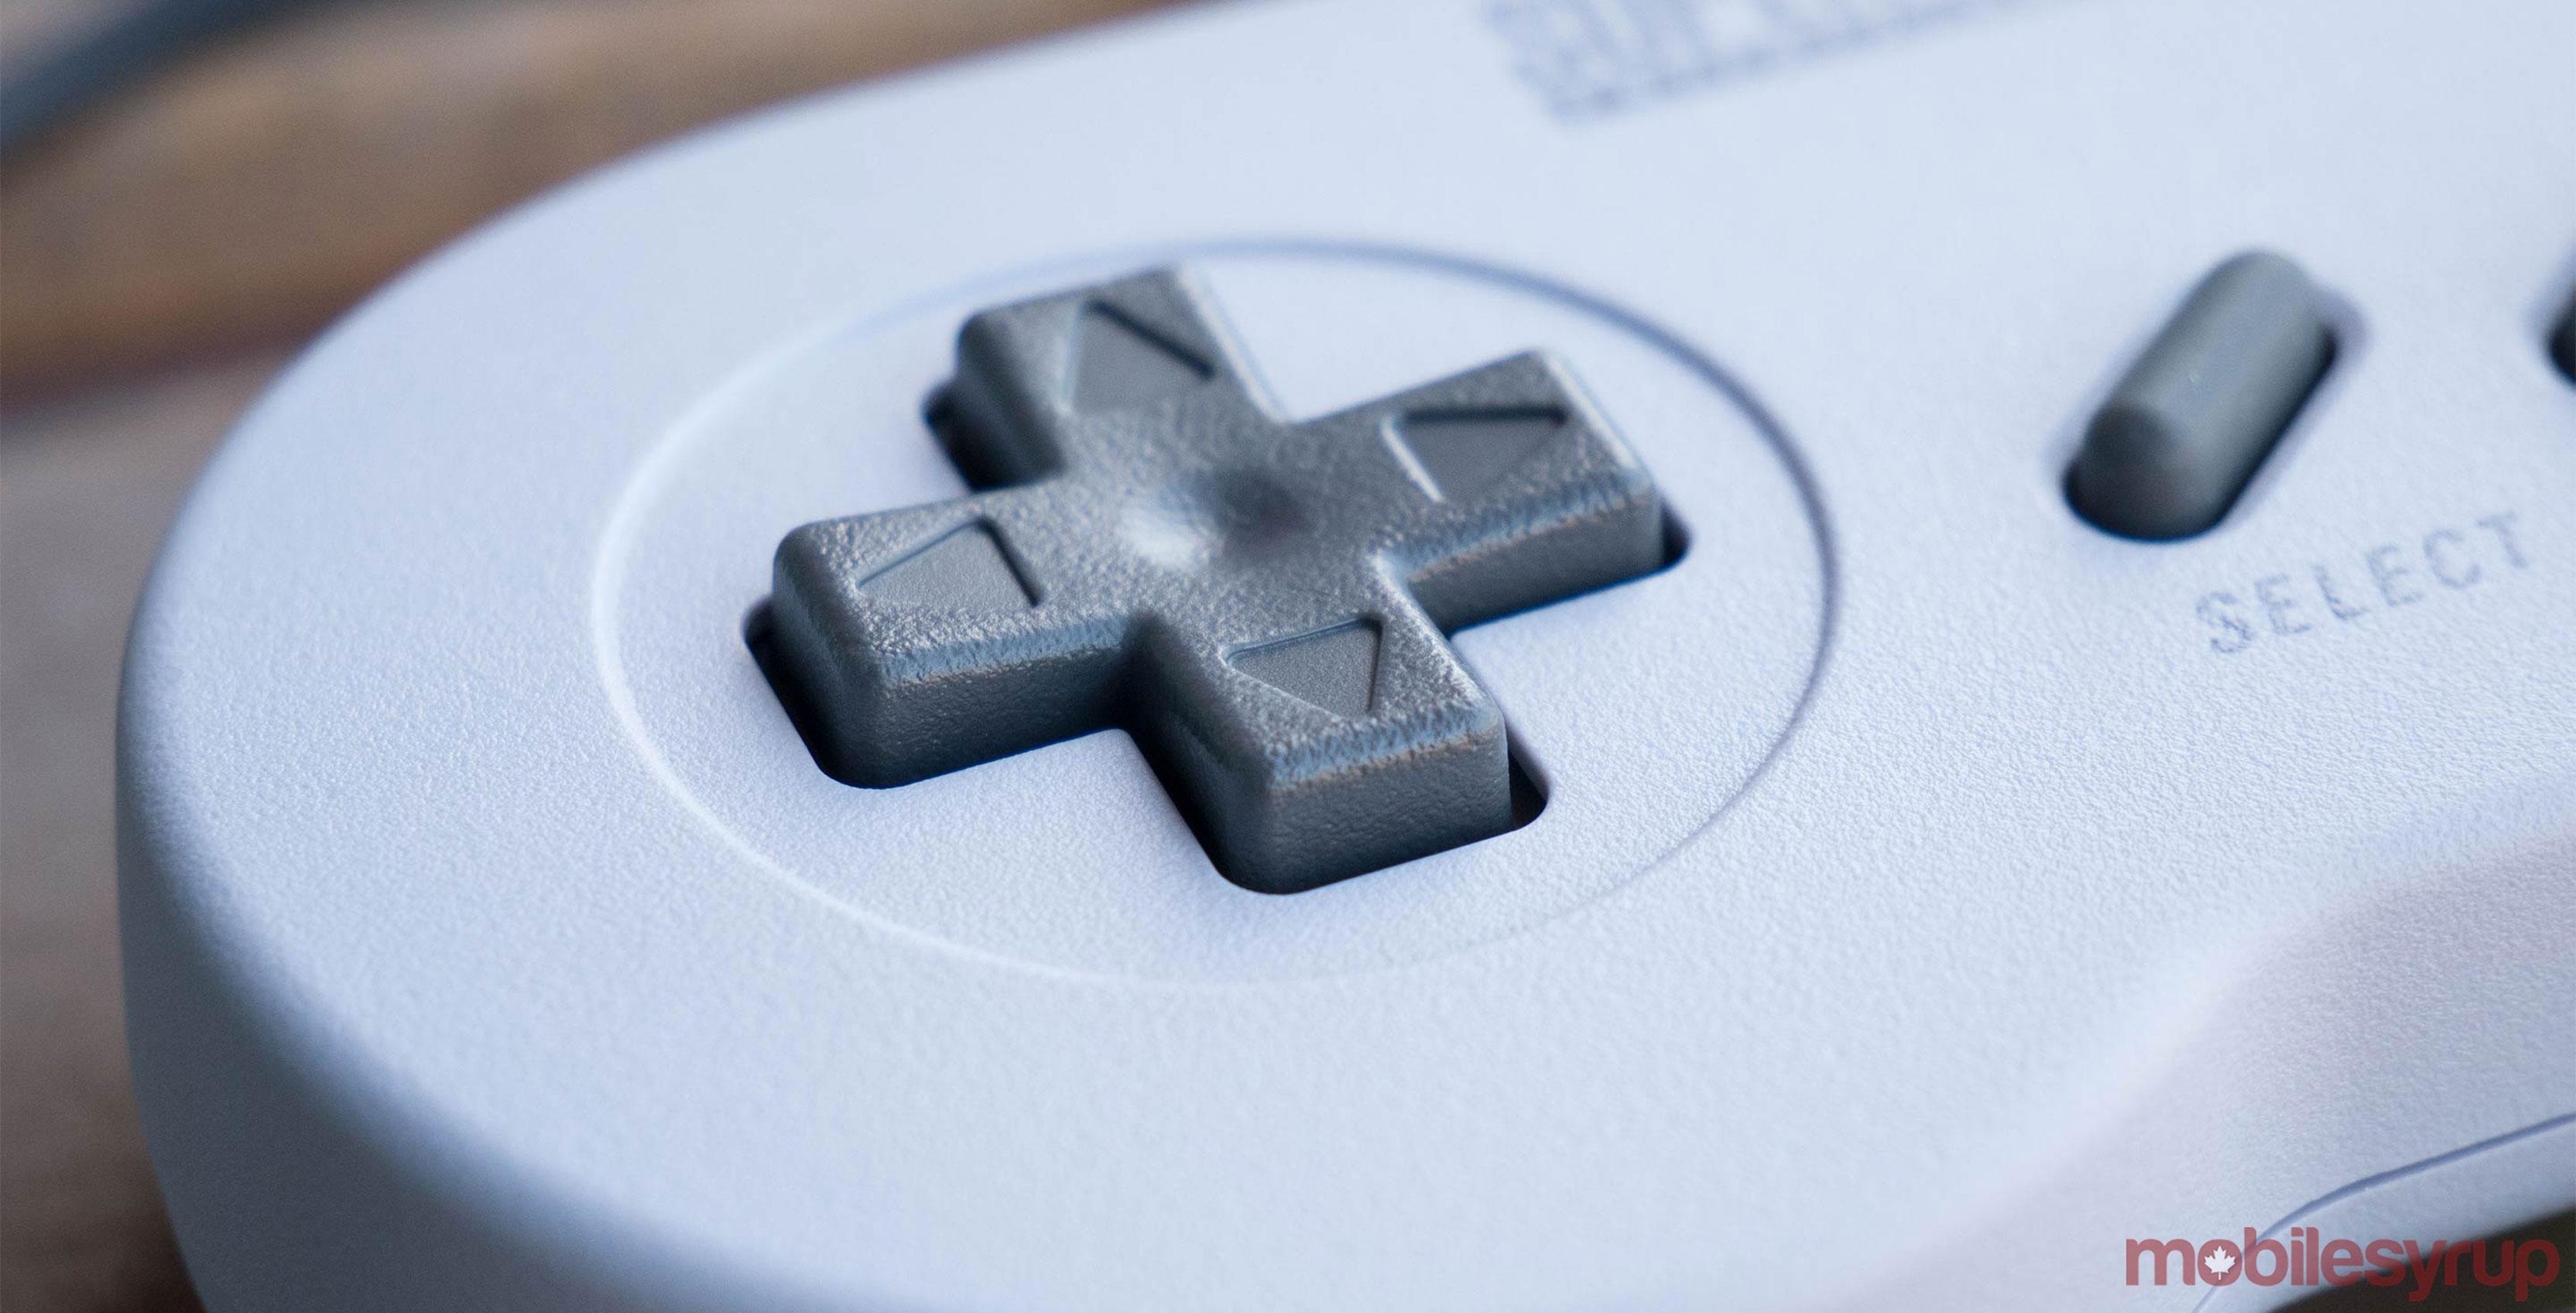 SNES classic controller close-up